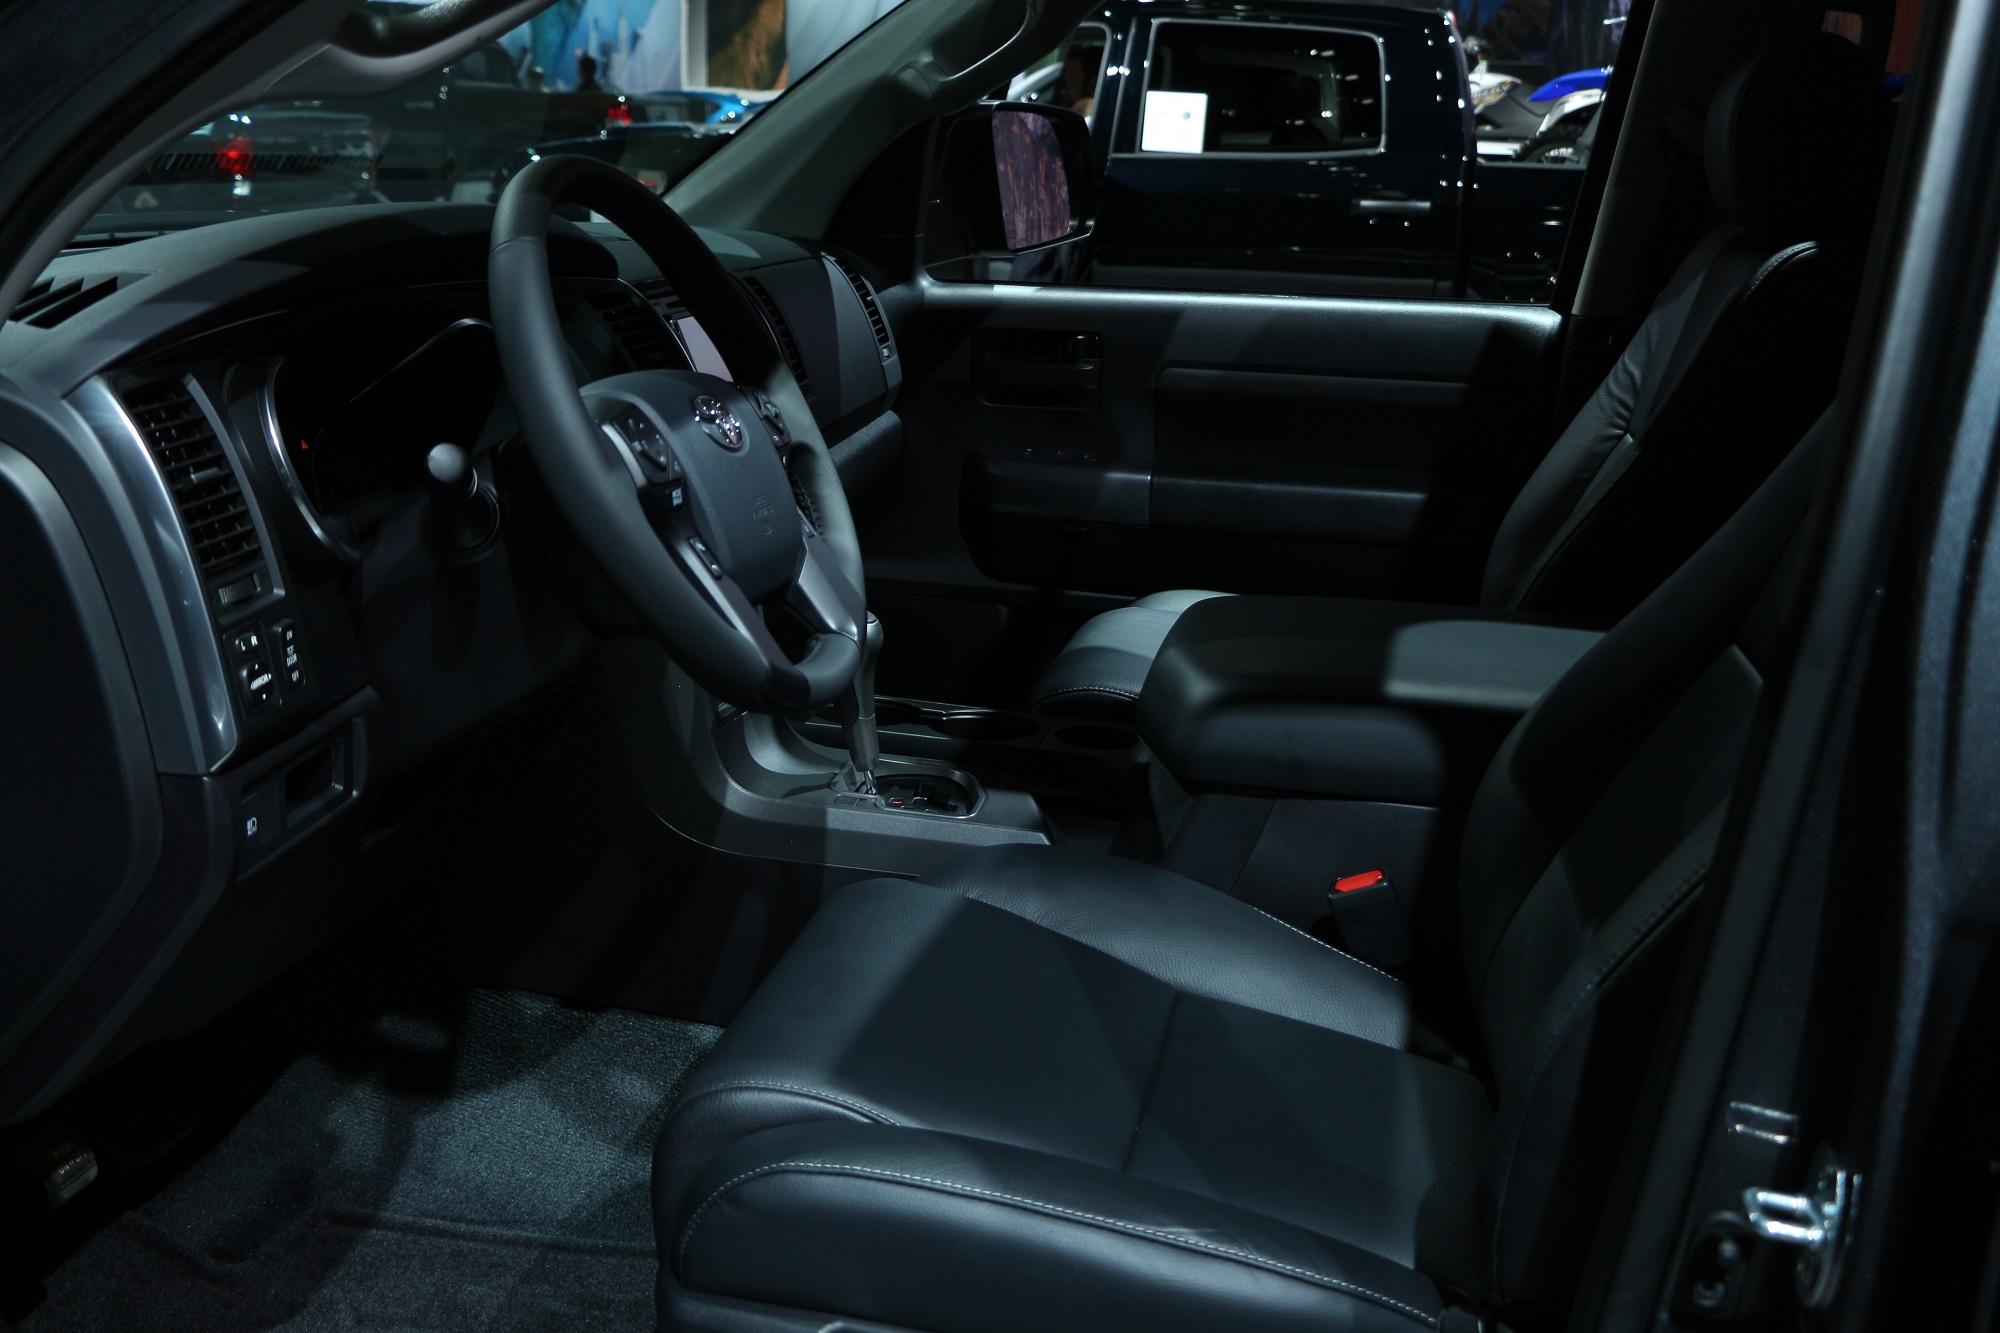 yotatech.com 2017 2018 LA Los Angeles Auto Show Toyota TRD Pro Tacoma 4x4 TRD Sport 4runner Tundra Land Cruiser Sequoia Trucks SUV Truck